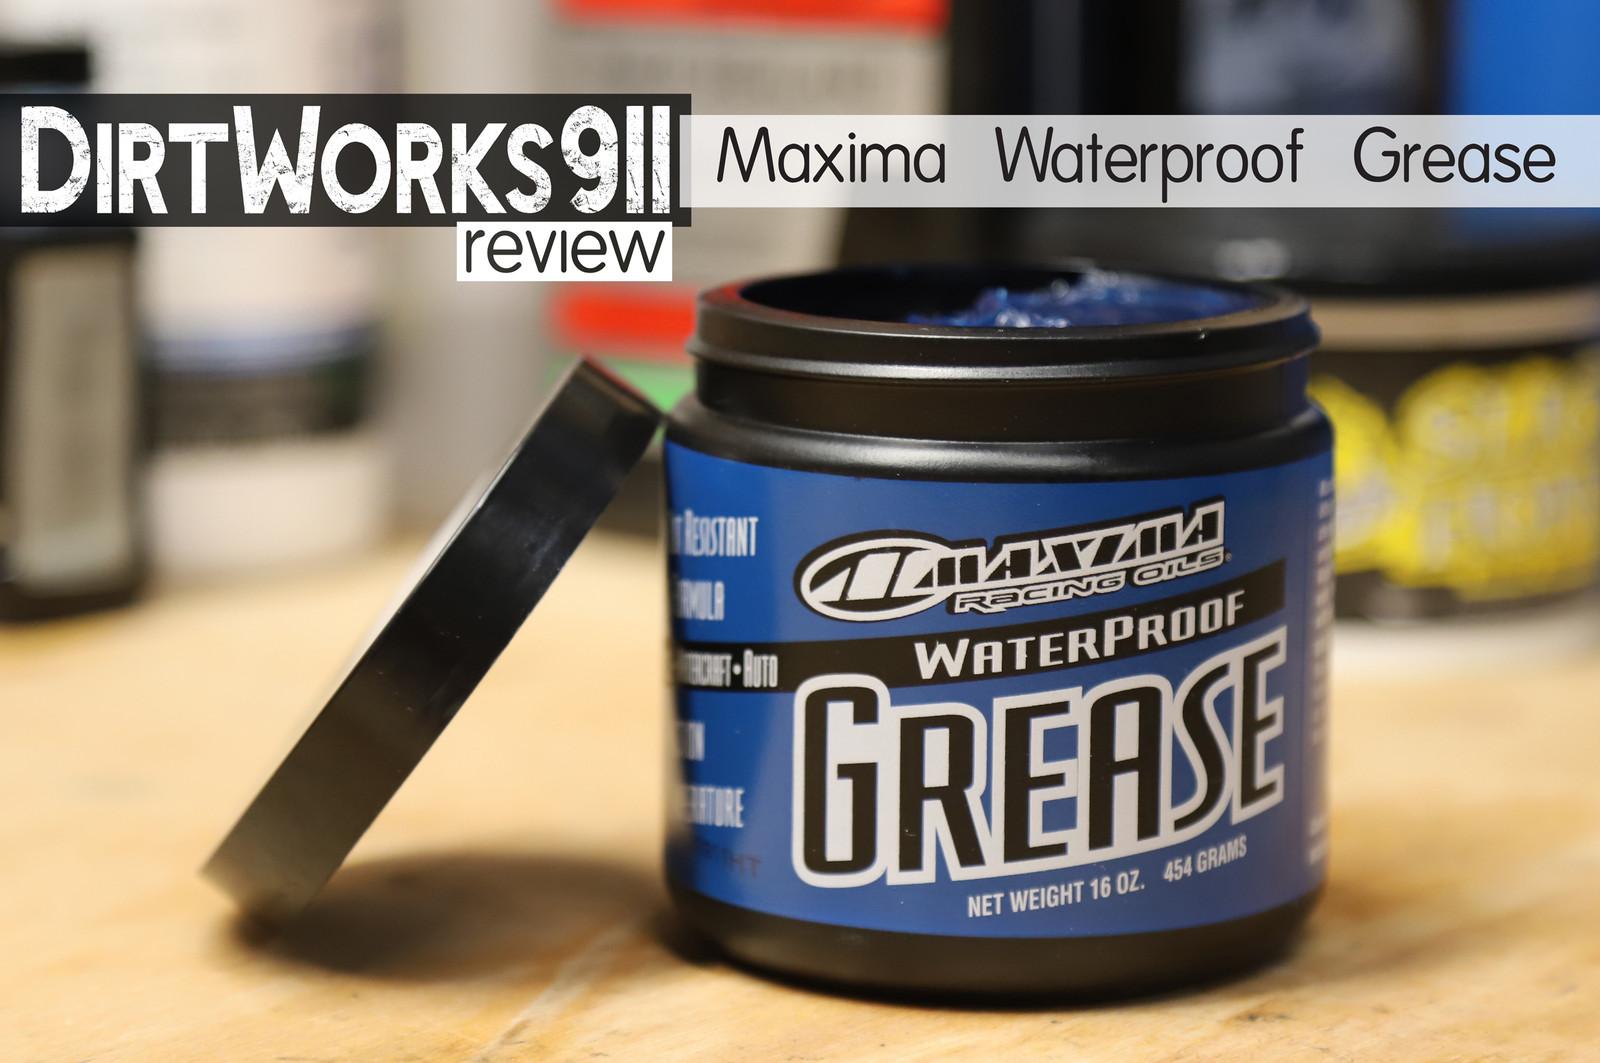 Maxima Waterproof Grease